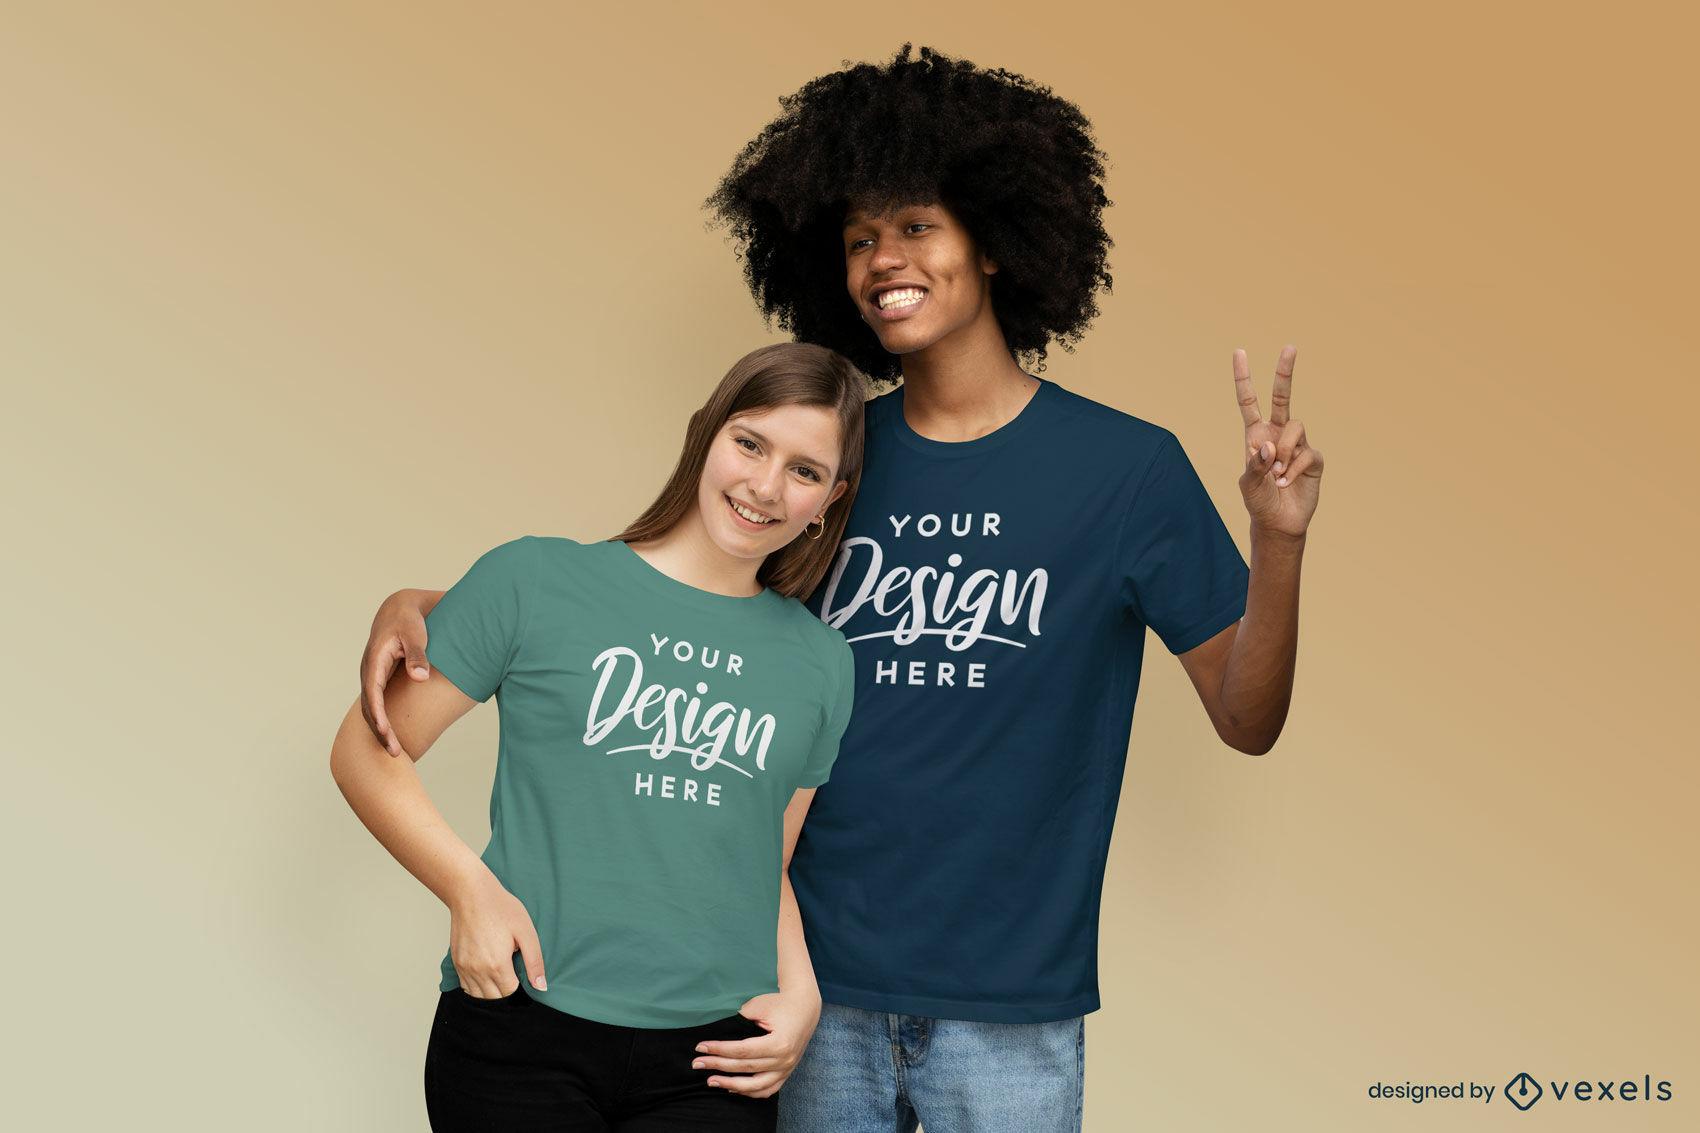 Maqueta de camiseta de fondo sólido de pareja feliz